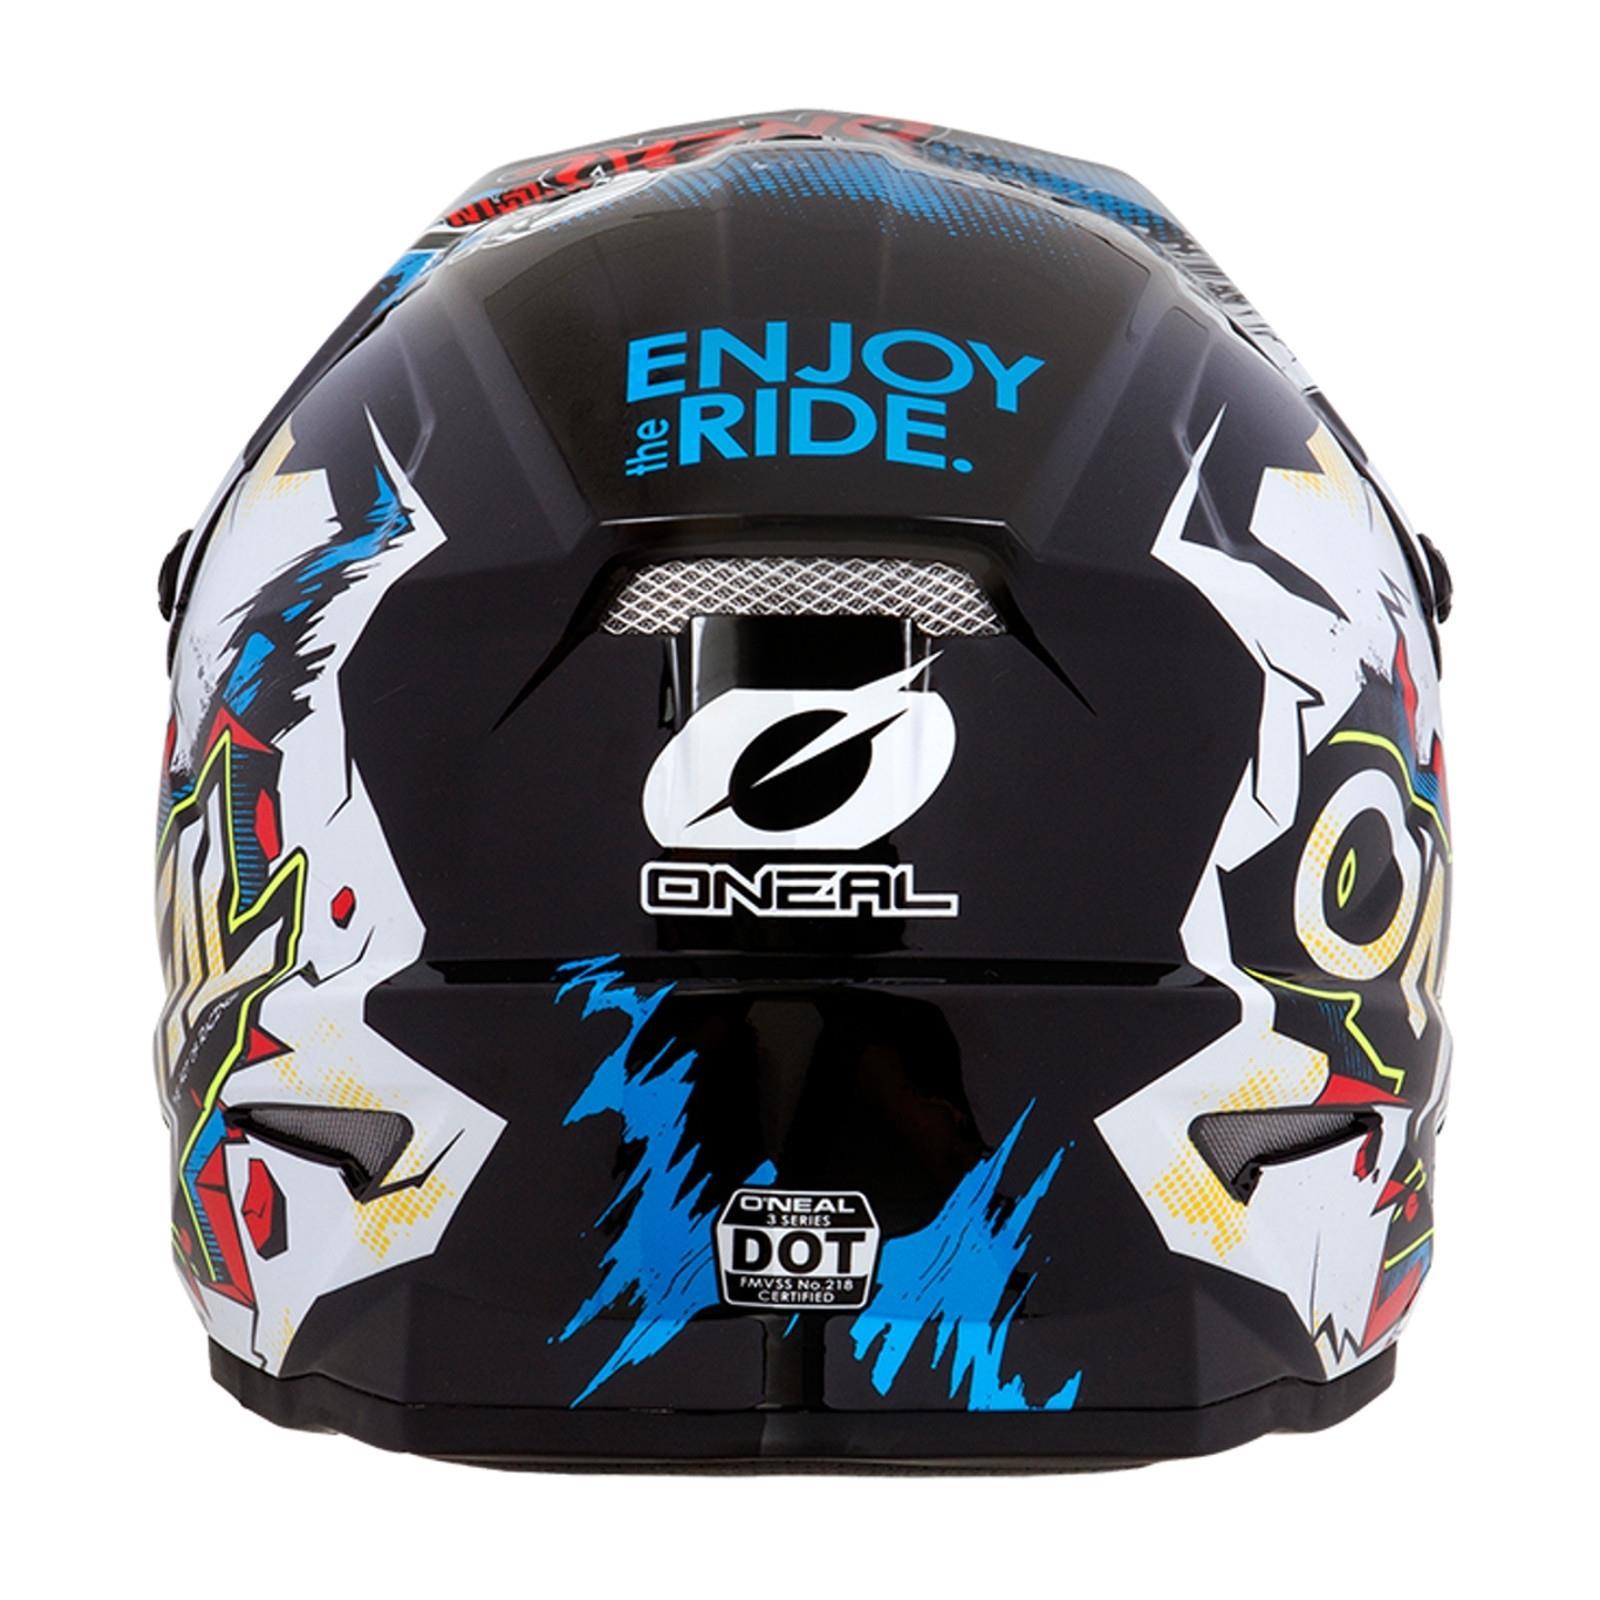 ONeal-Motocross-casco-MX-ENDURO-MOTO-BICI-FUORISTRADA-CROSS-Series-Adventure miniatura 53